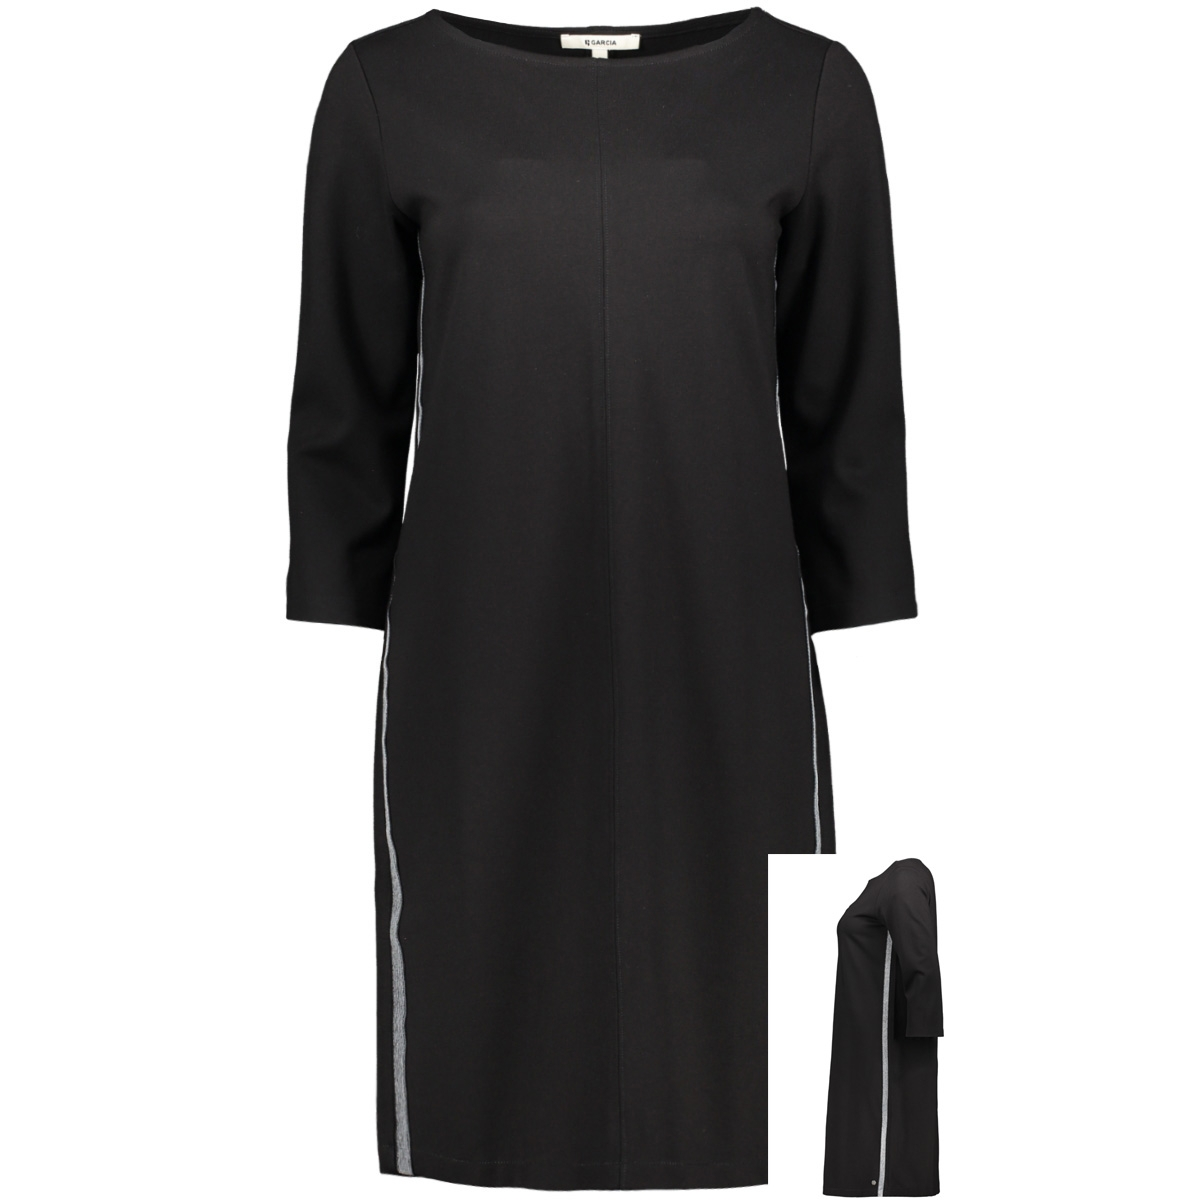 jurk met glitterstrepen k90080 garcia jurk 60 black